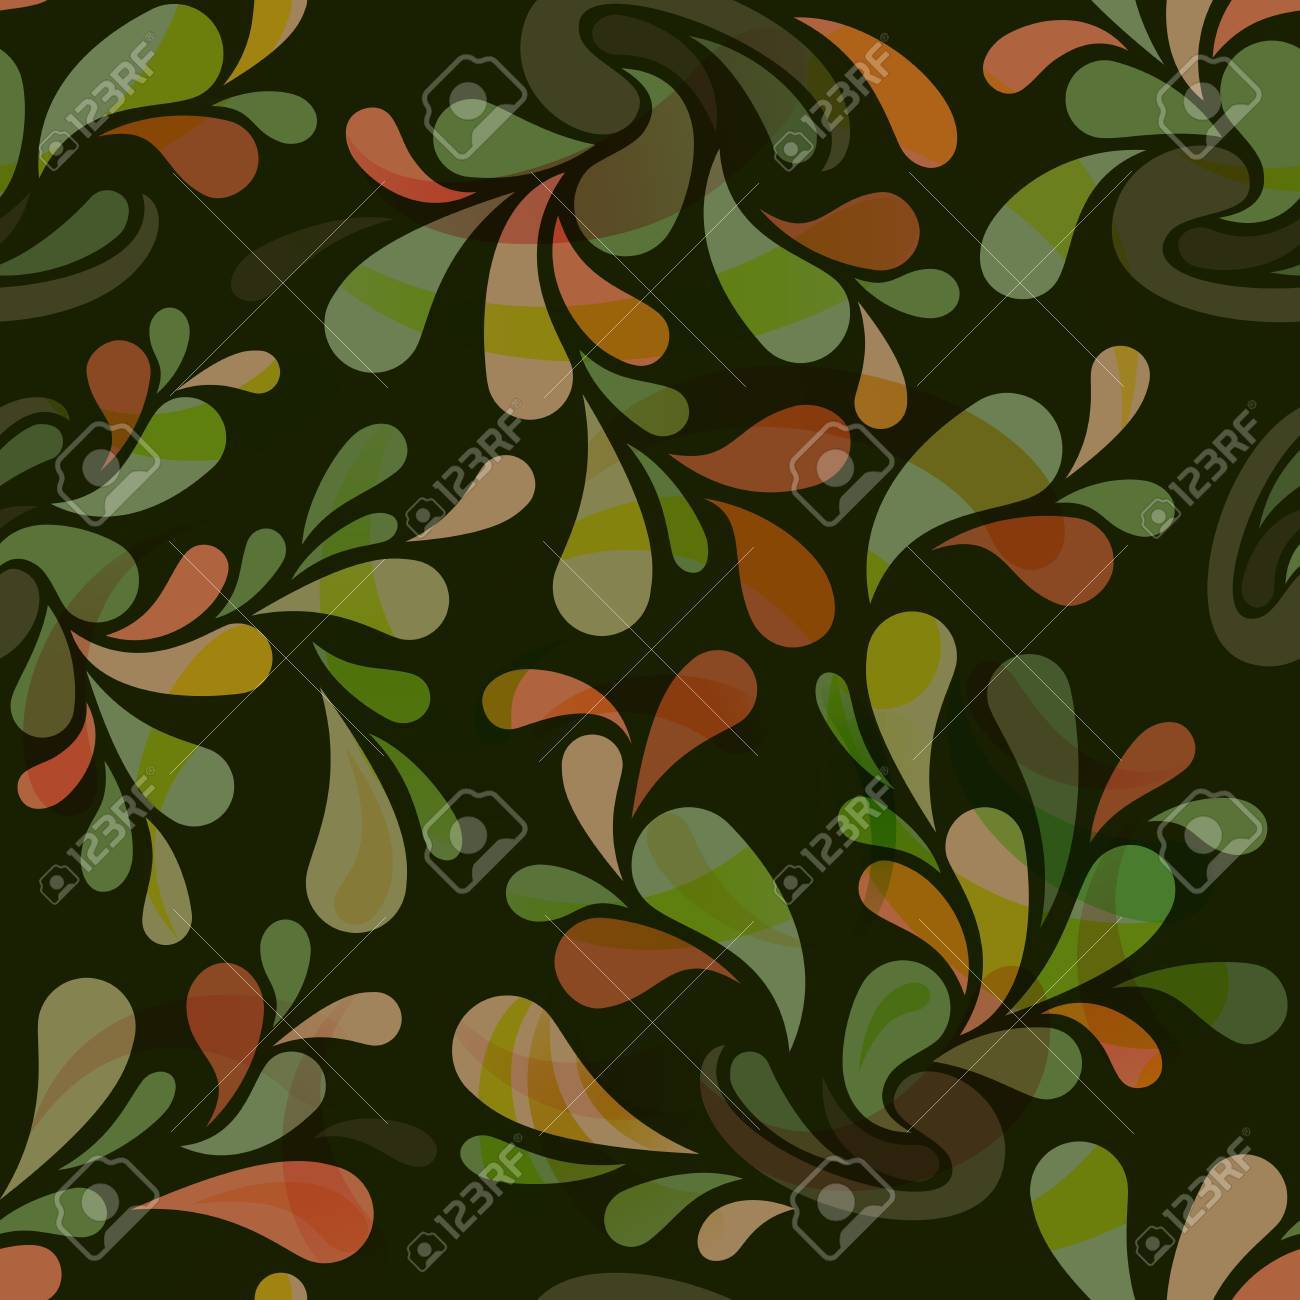 Seamless Dark Green Floral Wallpaper Pattern Royalty Free